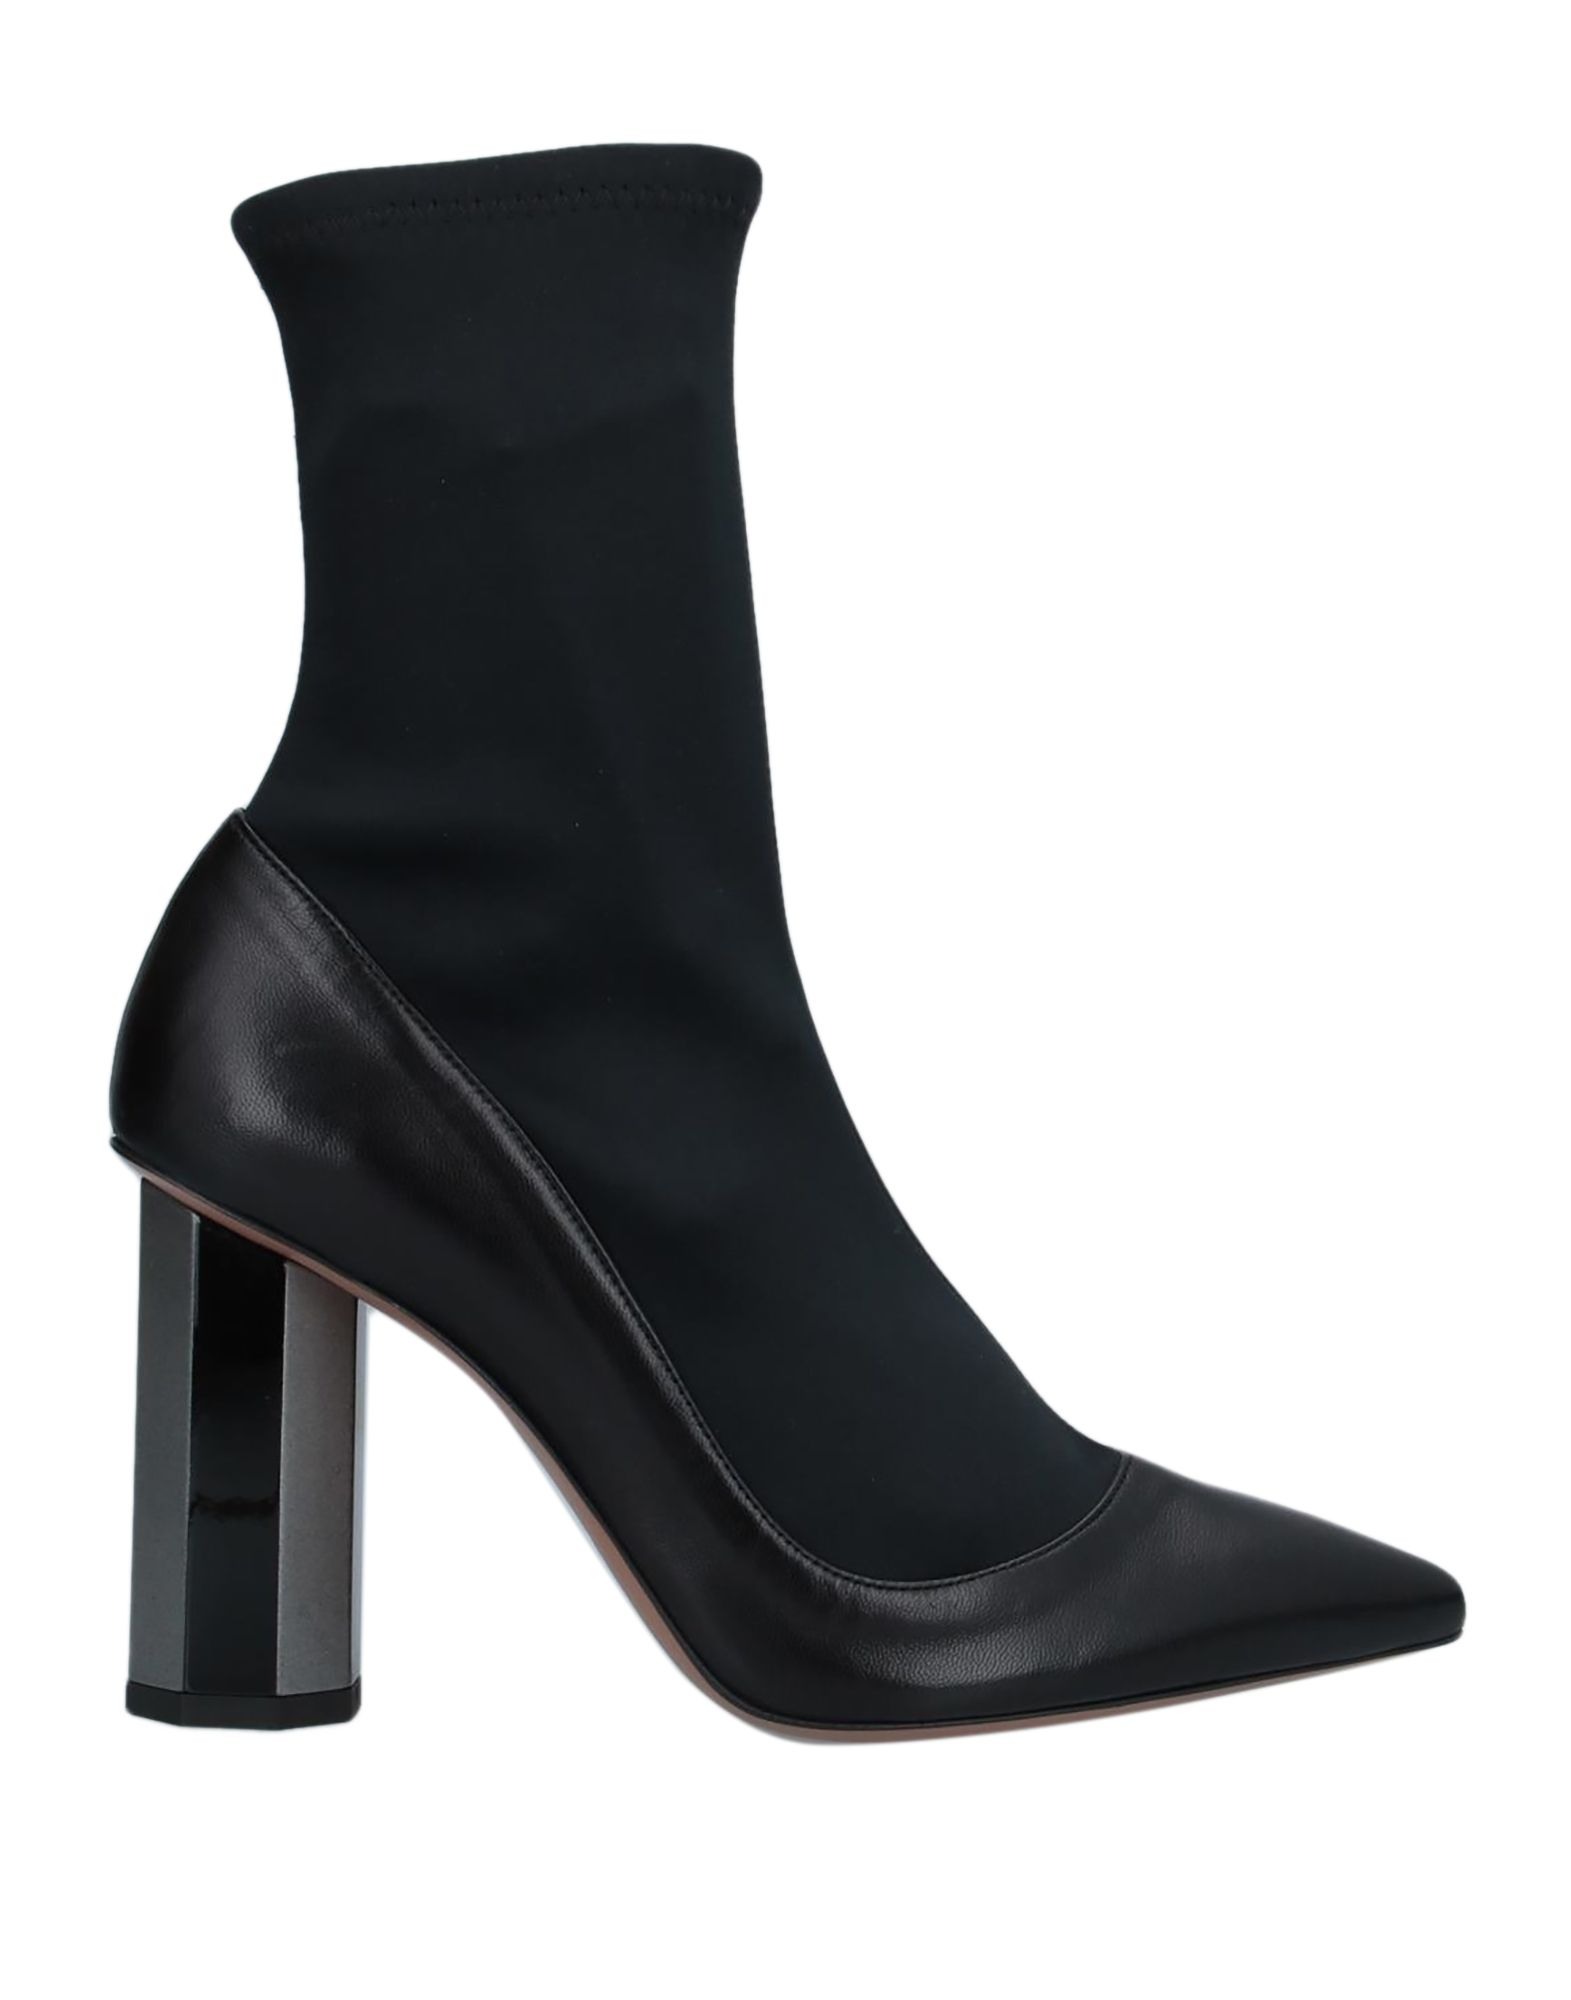 G.P. PER NOY BOLOGNA Полусапоги и высокие ботинки matteo pitti bologna полусапоги и высокие ботинки